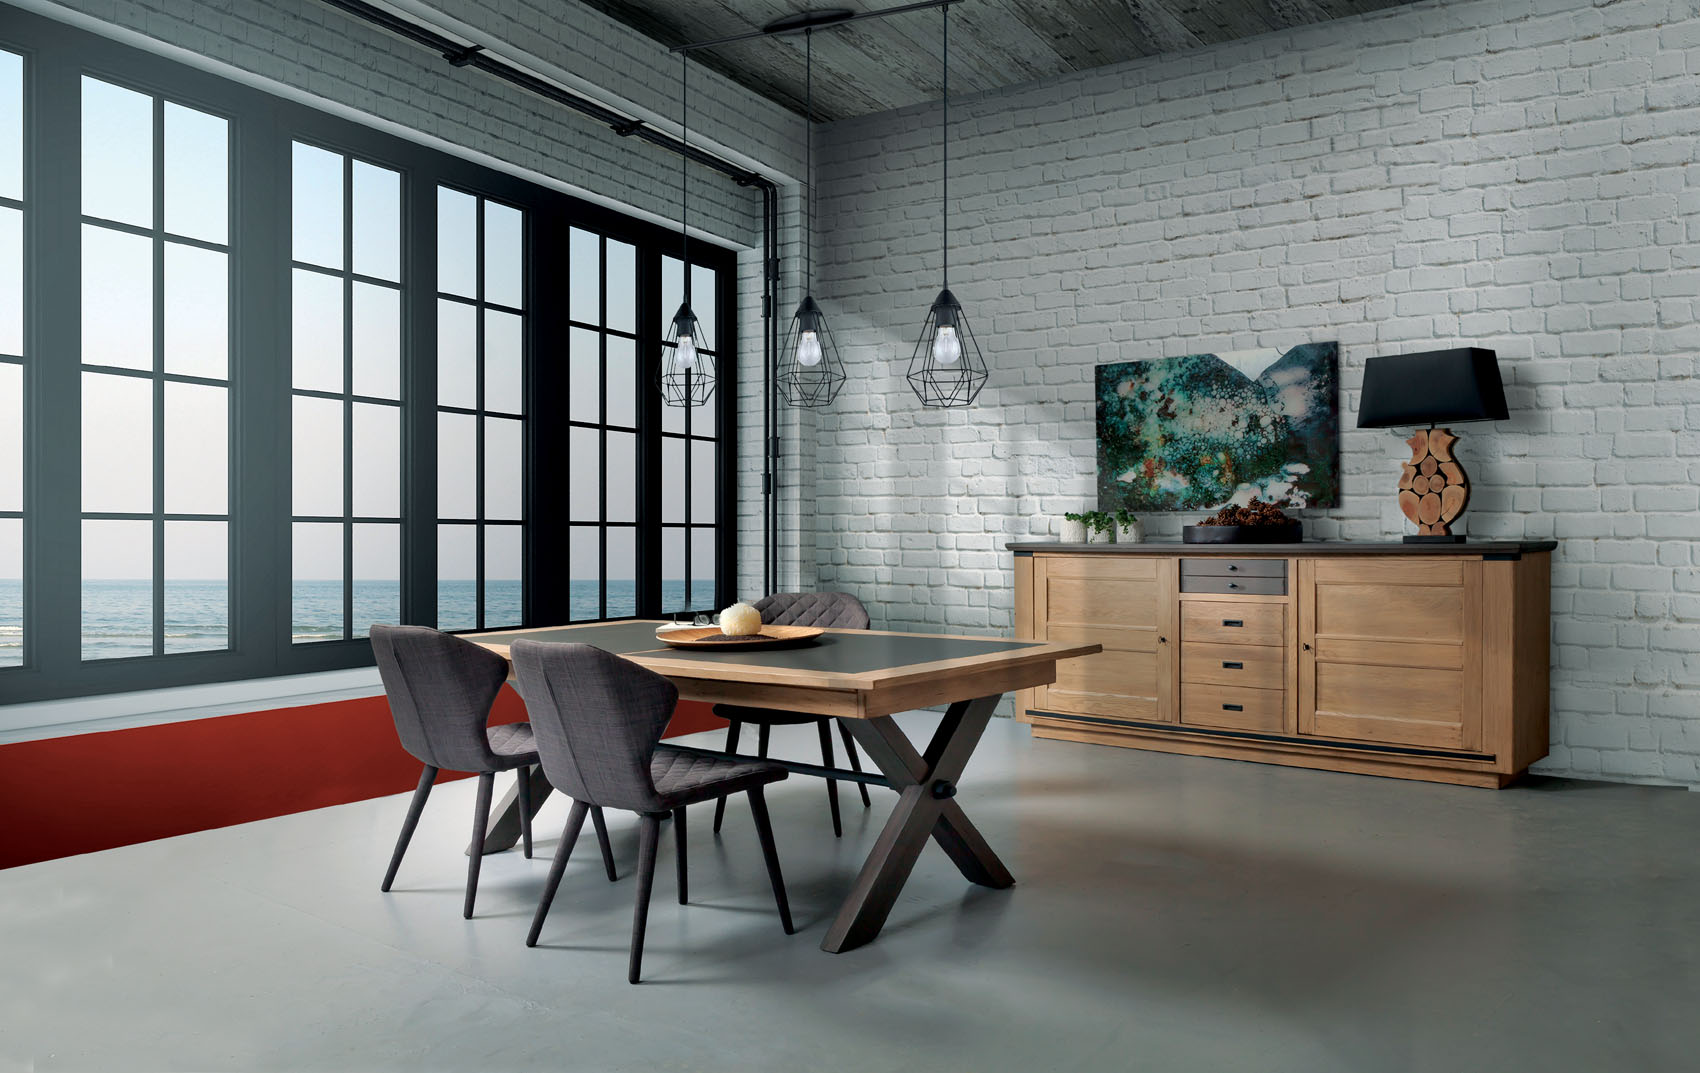 meuble salle a manger magellan ateliers de langres meubles